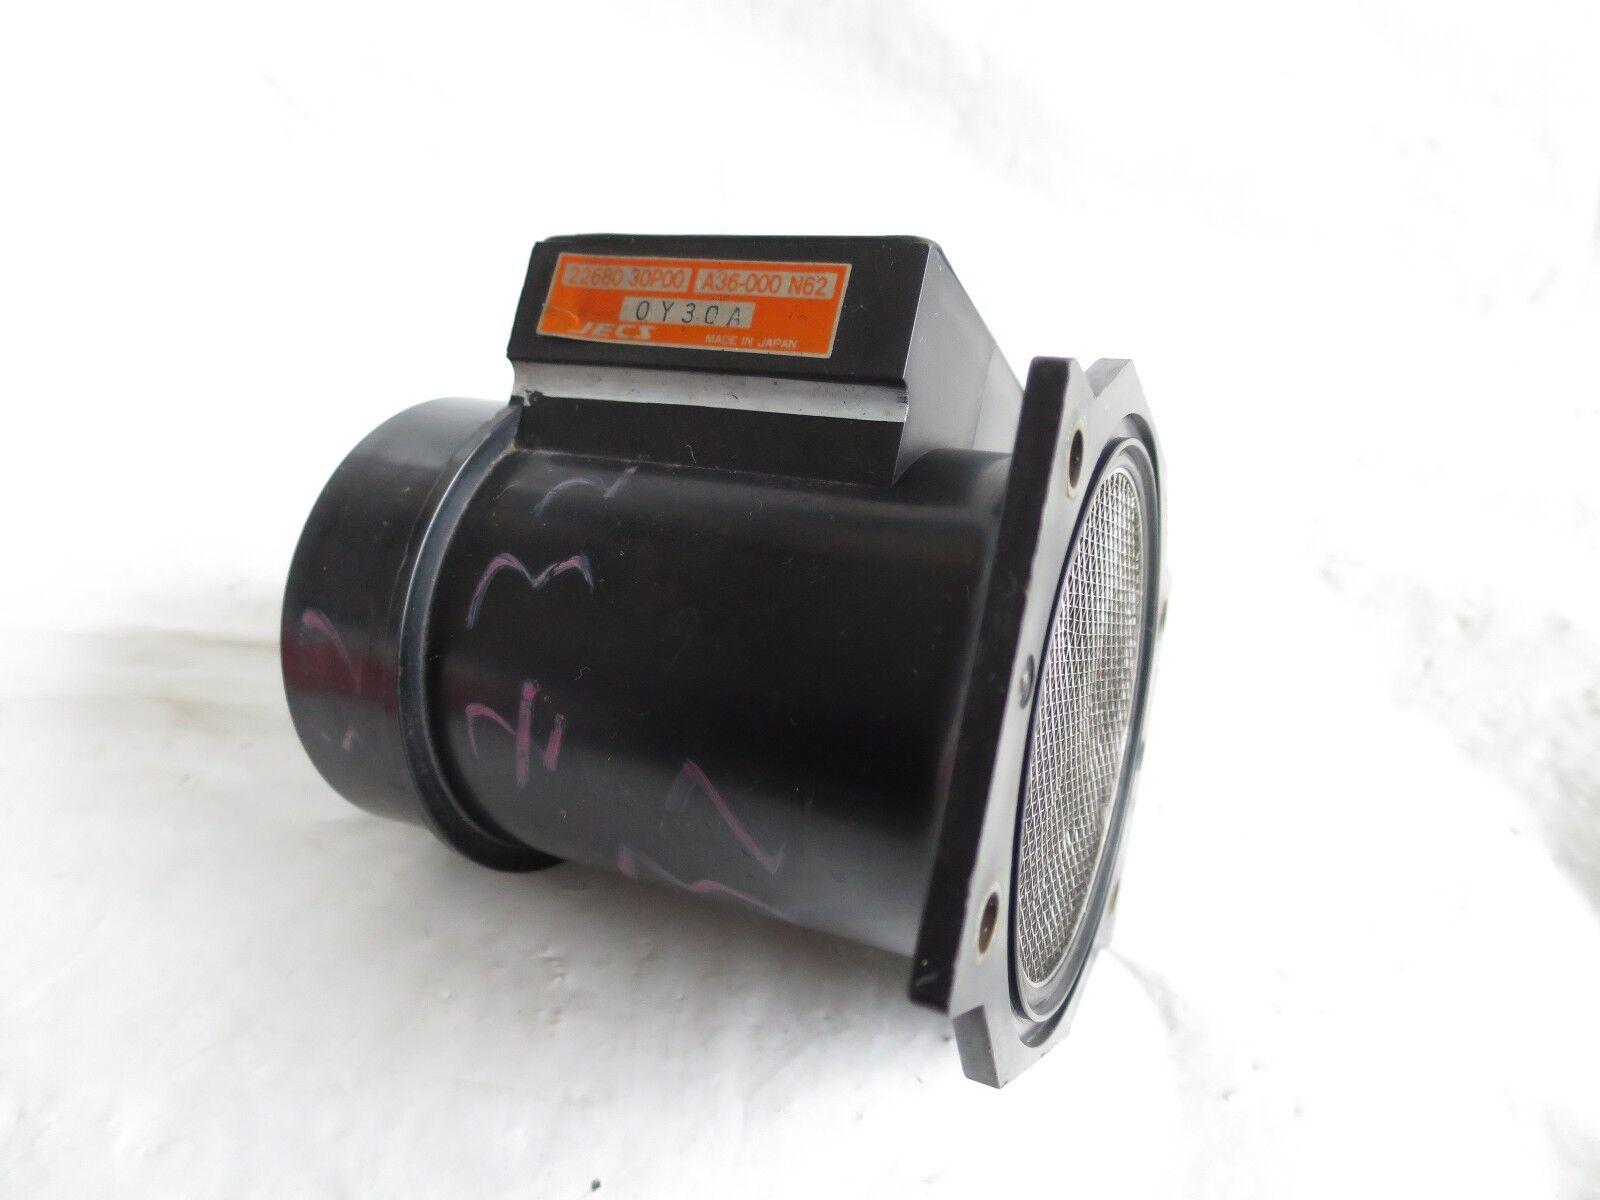 Oem 90 96 Nissan 300zx Maf Stock Mass Air Flow Meter 22680 30p00 A36 Z32 Wiring 000 N62 Afm Ebay